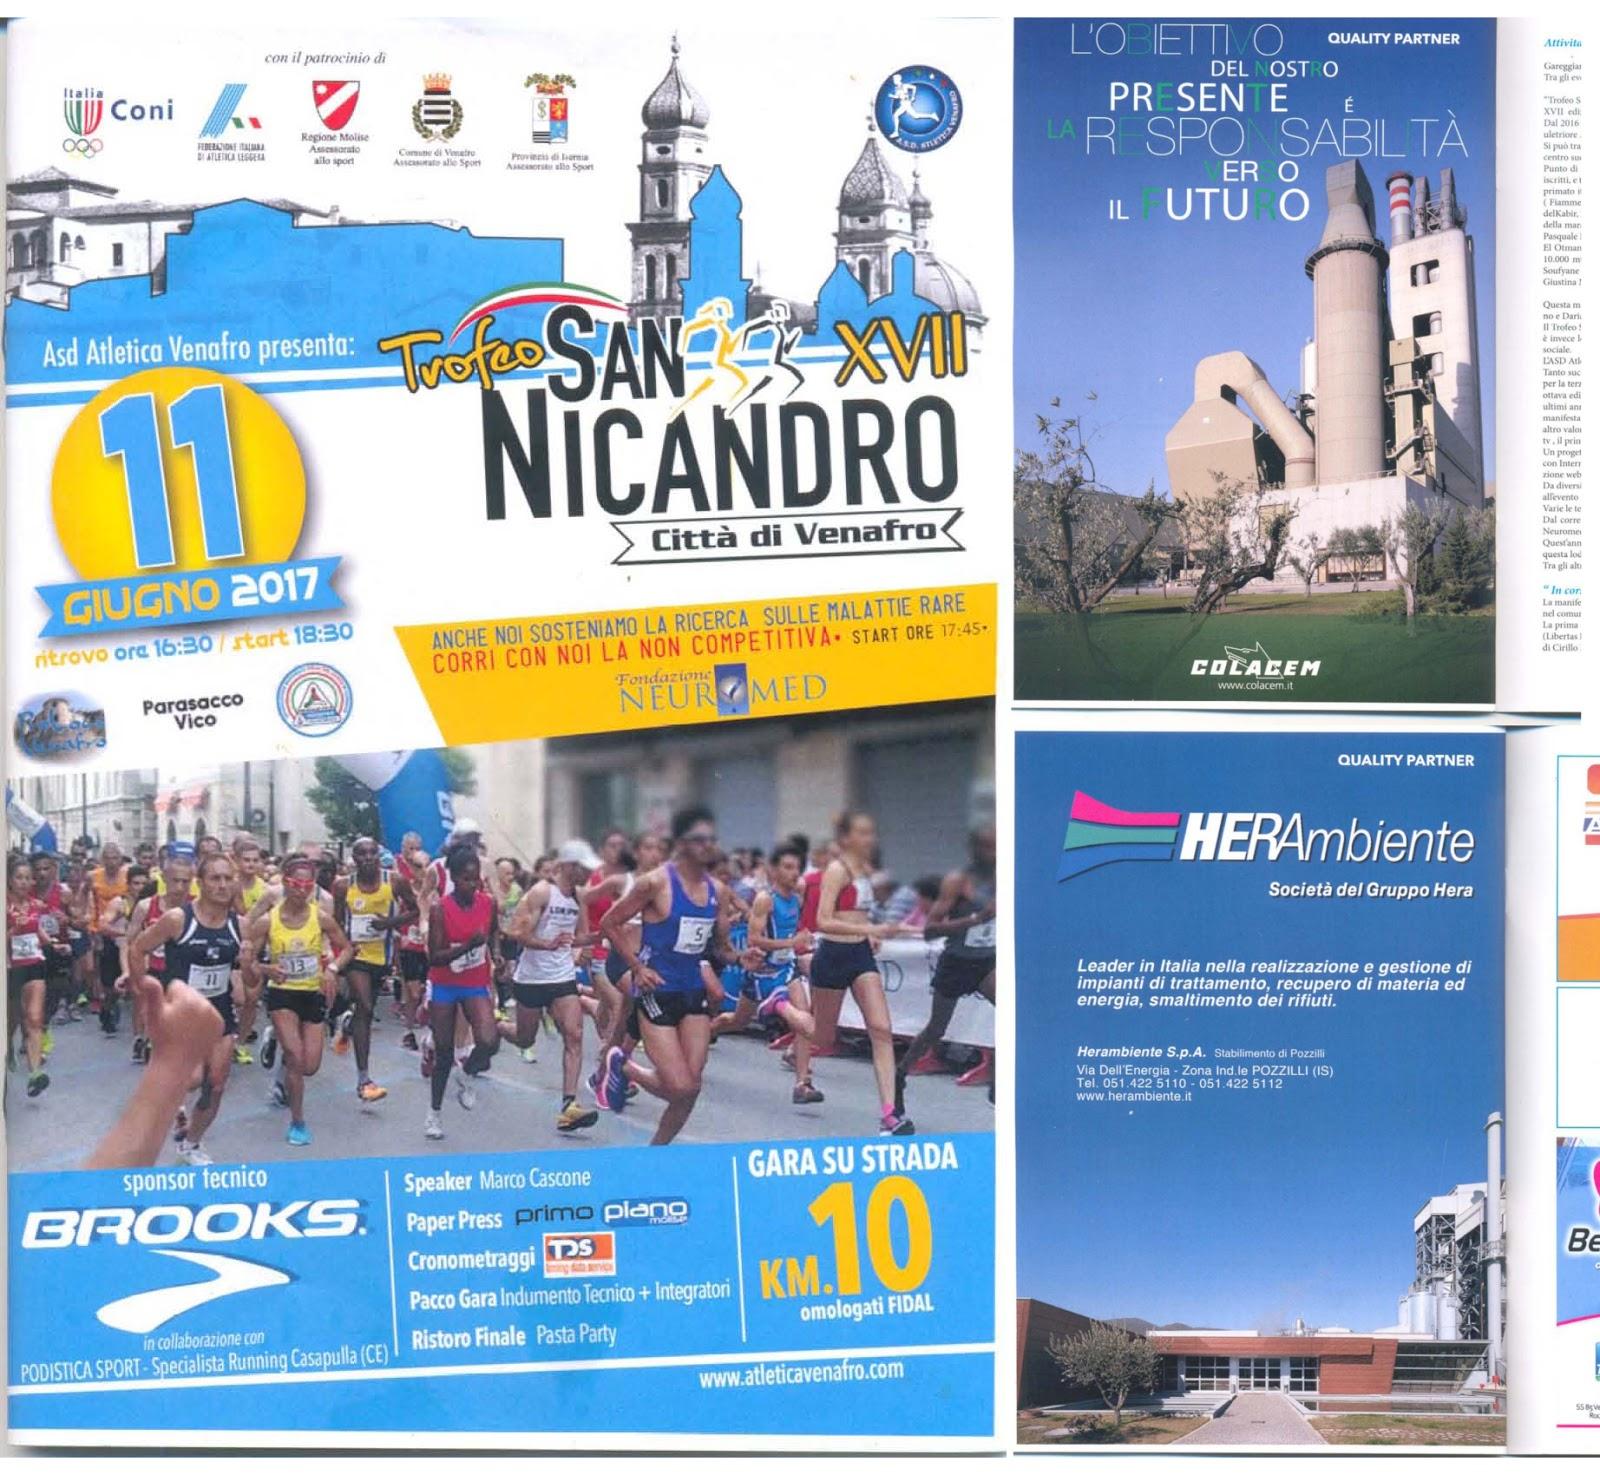 Photo of Trofeo San Nicandro 2017  11 Giugno 2017